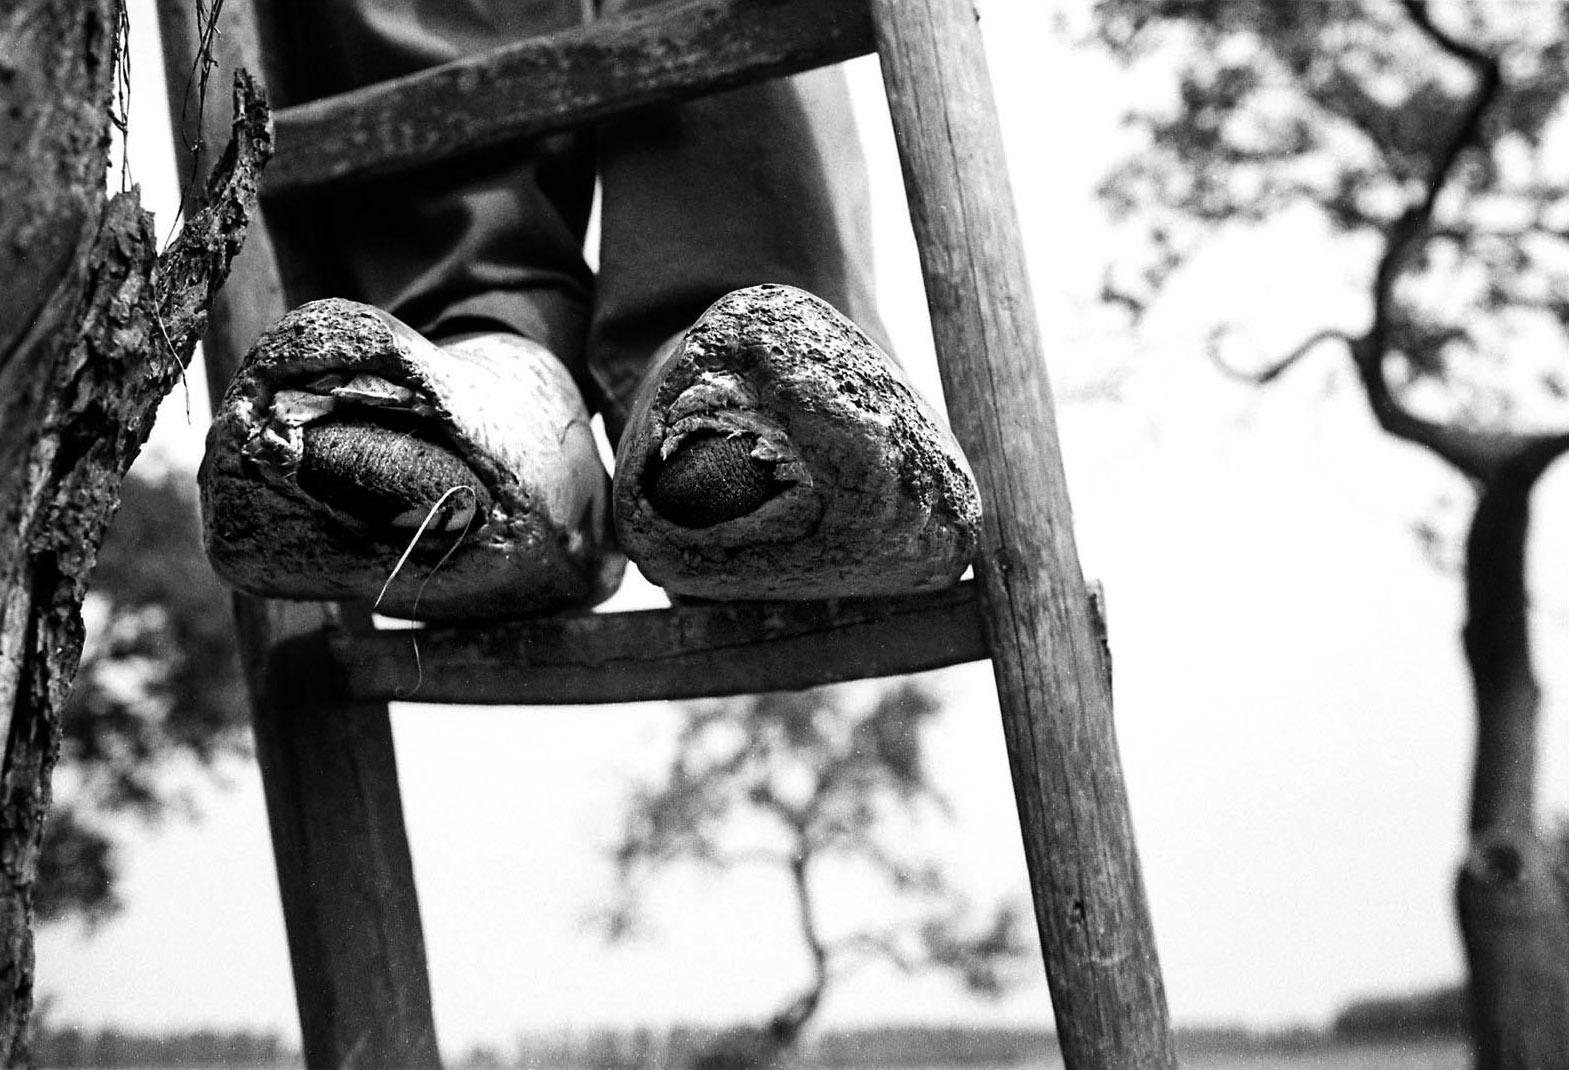 foto: Marcel van den Bergh - kapotte klompen op ladder